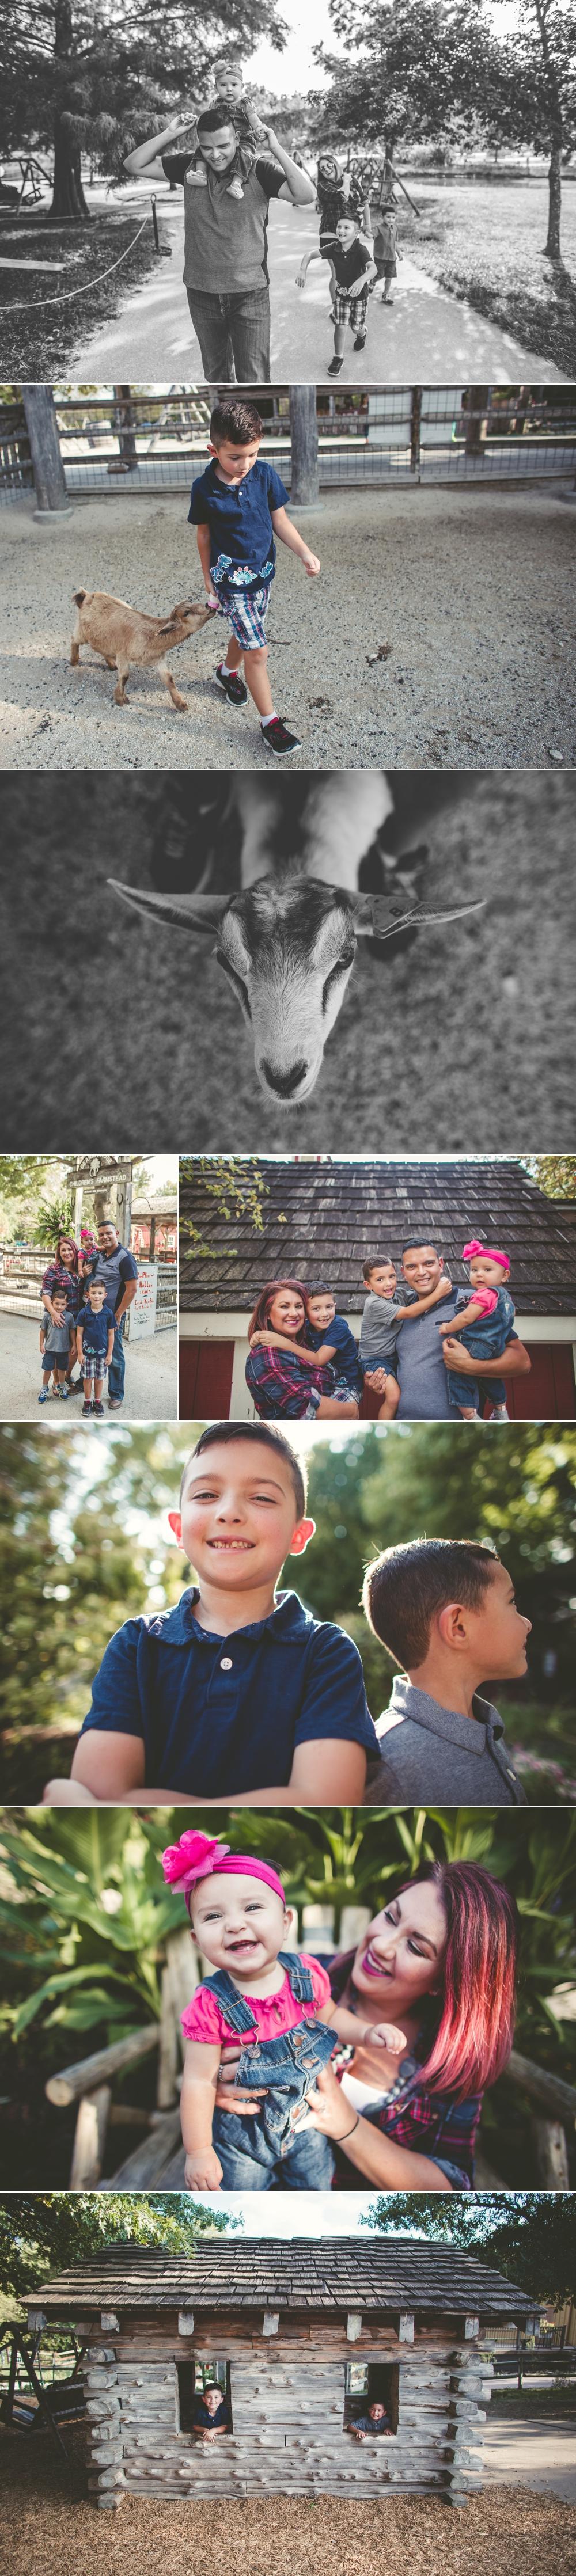 jason_domingues_photography_kansas_city_family_portraits_kc_photo_session_deanna_rose0001.JPG